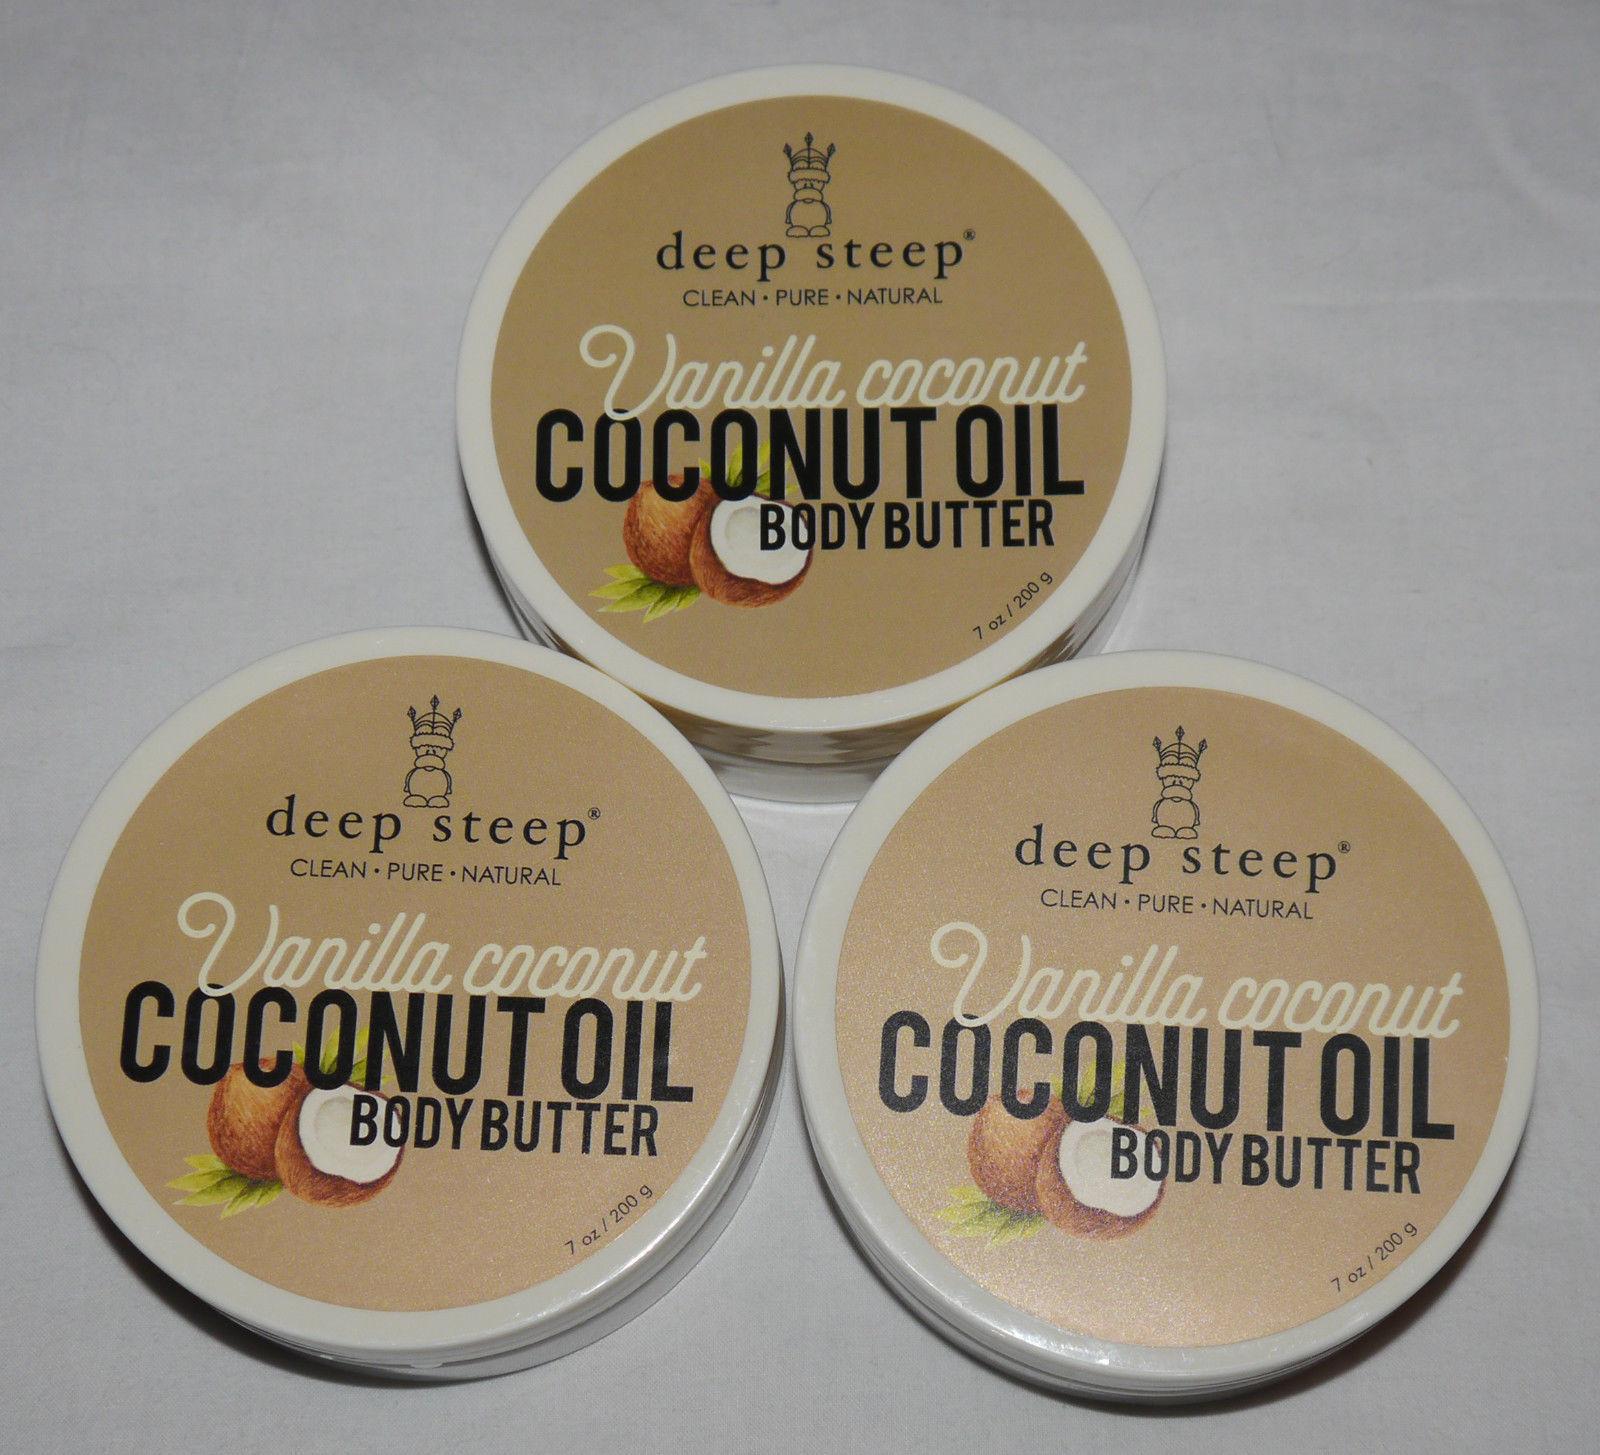 Lot Of 3 Deep Steep COCONUT OIL Vanilla Coconut Body Butter 7 oz Each 12641